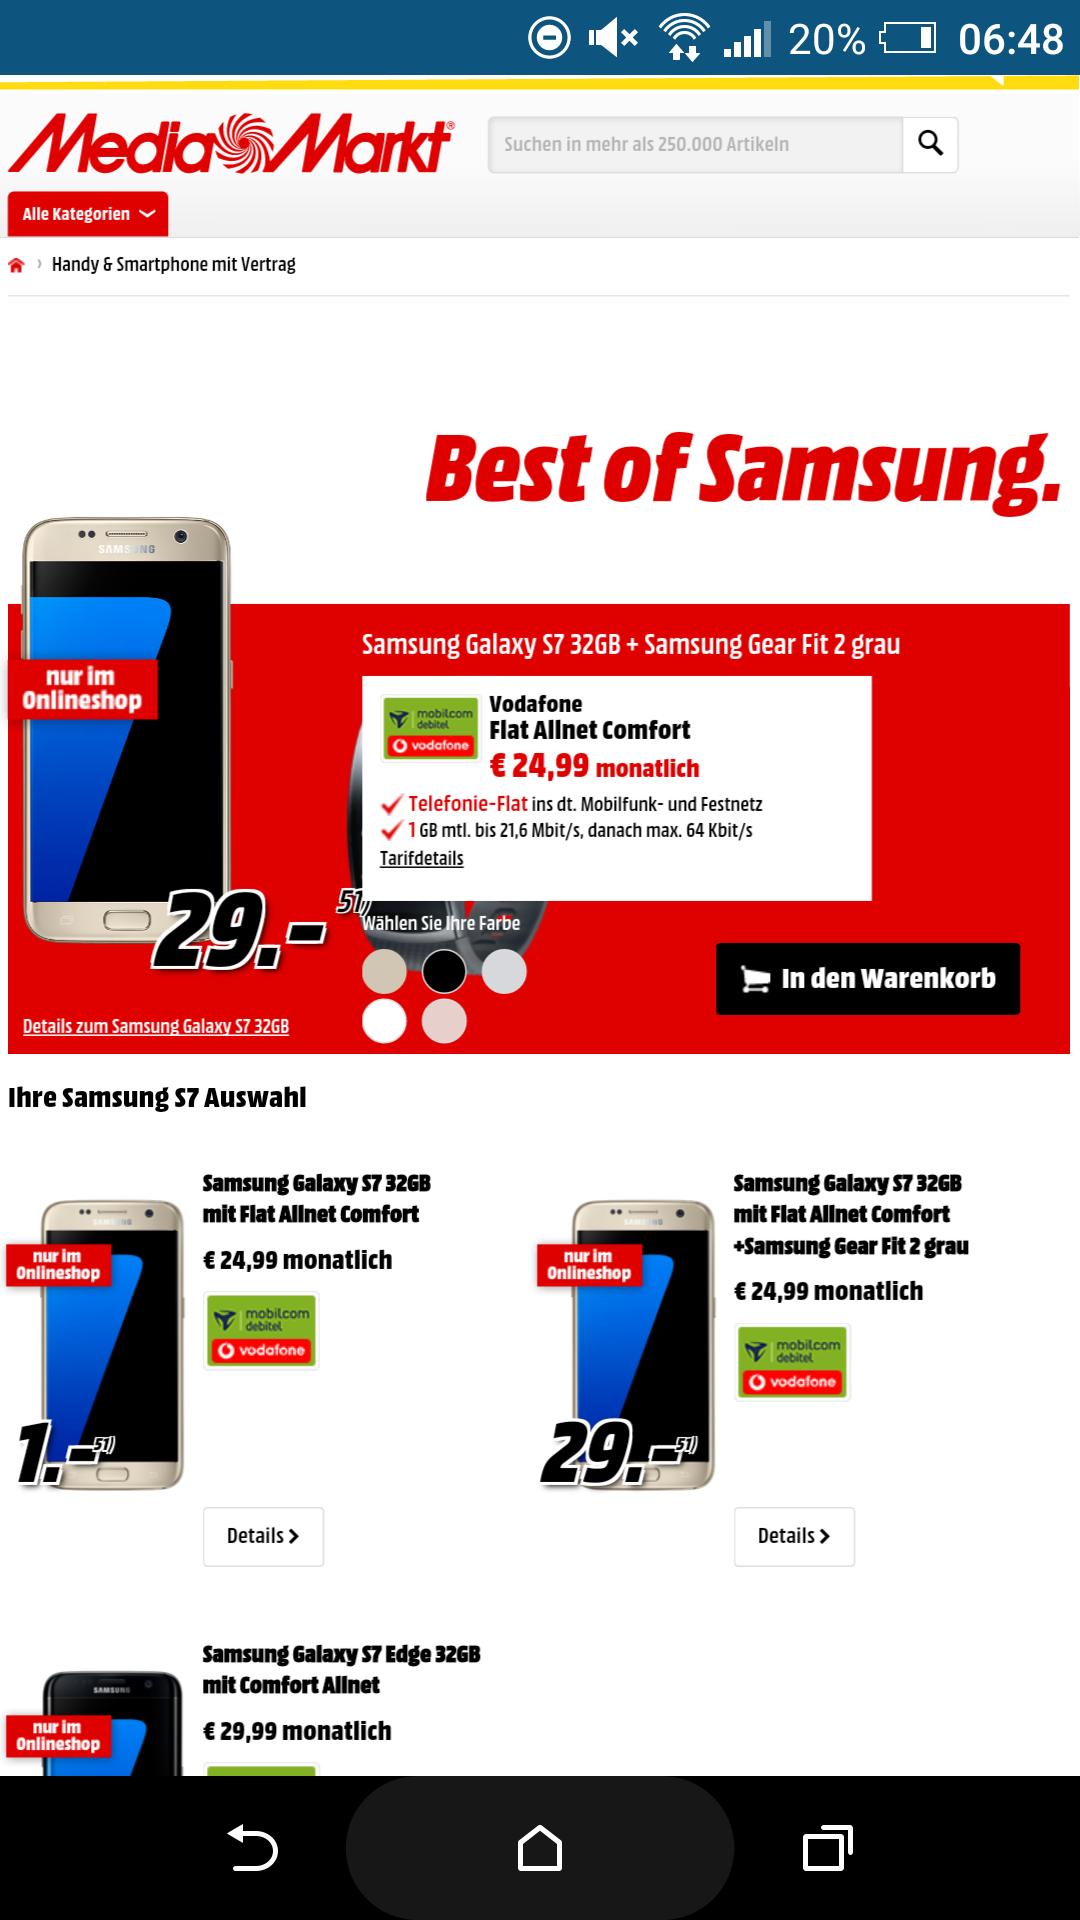 MM - Samsung Galaxy S7 32GB und Samsung Gear Fit 2 Größe L Dunkelgrau mit Flat Allnet Comfort Mobilcom Debitel